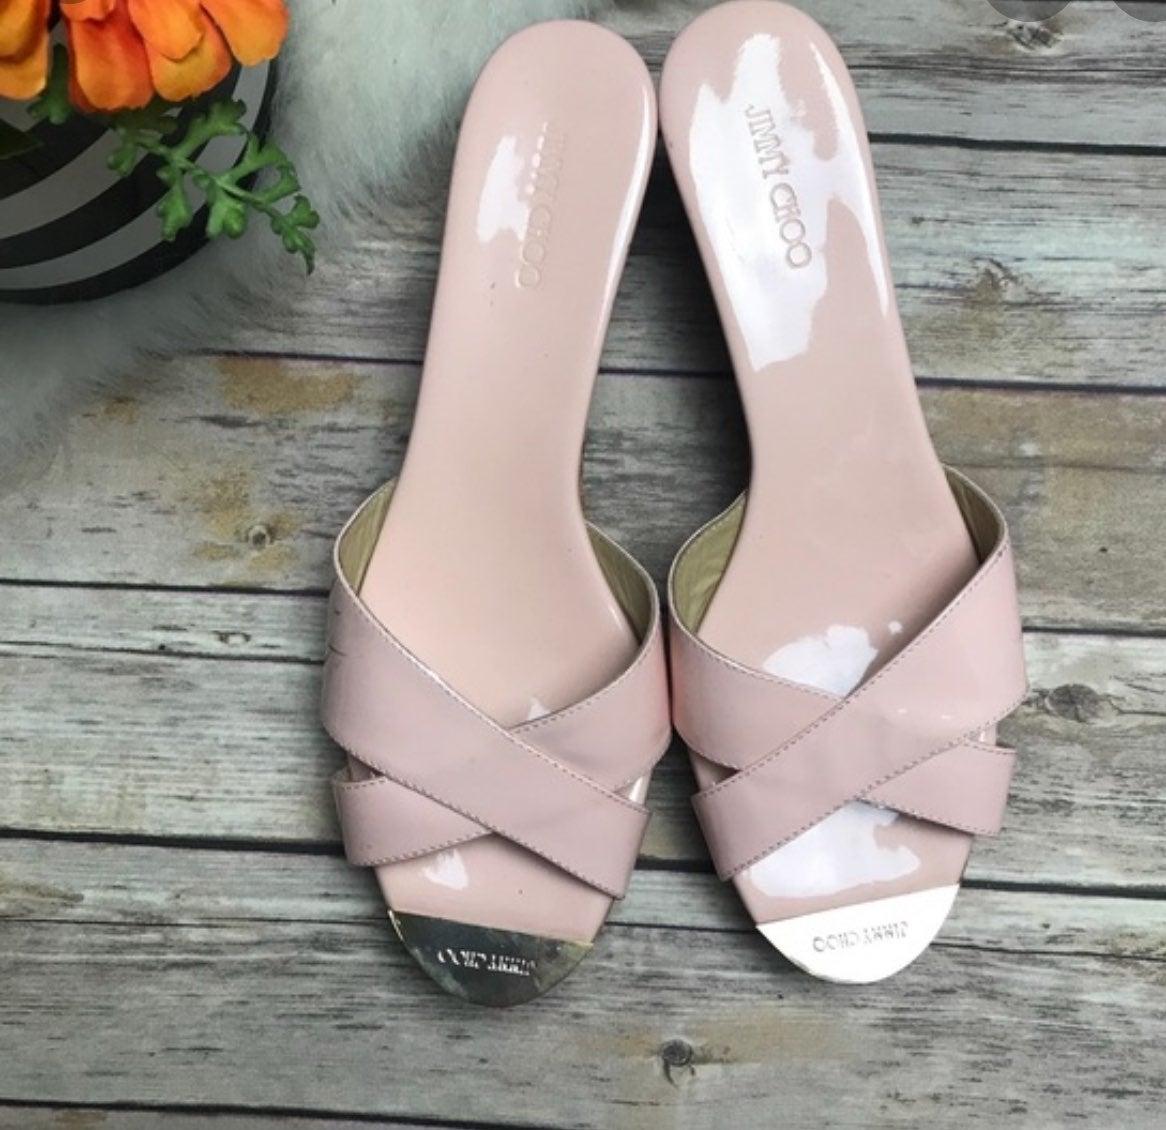 Jimmy Choo Panna sandal 7